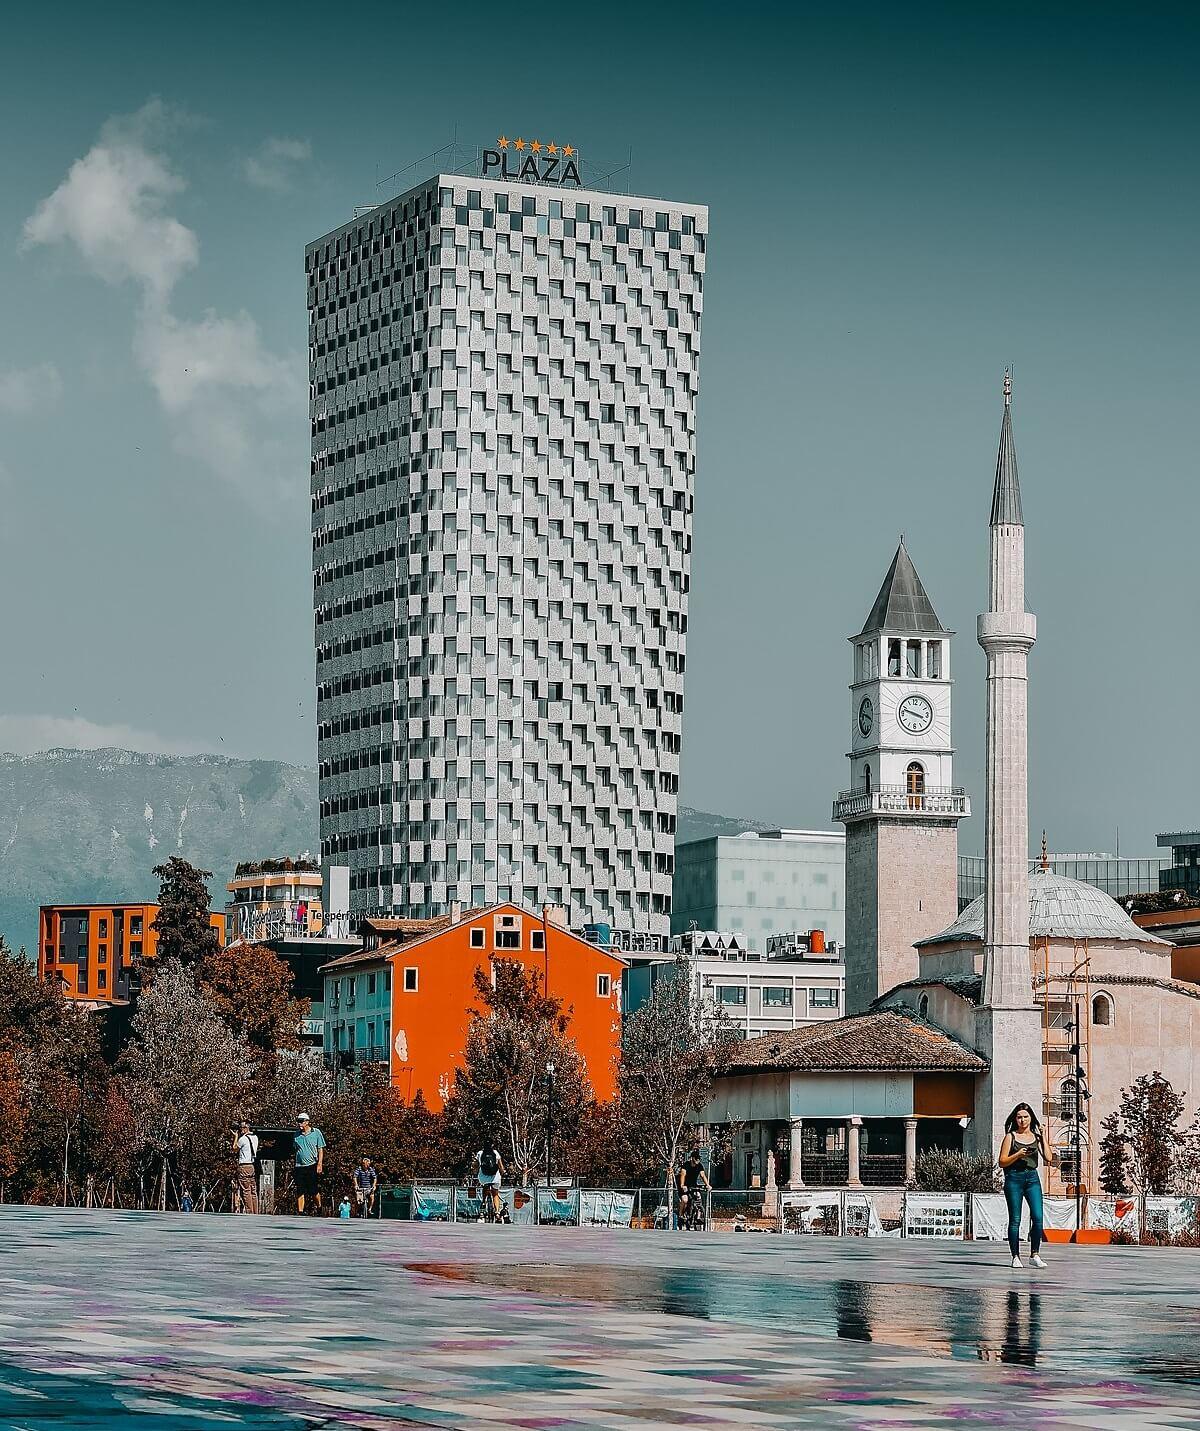 International hotel group Maritim opens two new properties in Europe